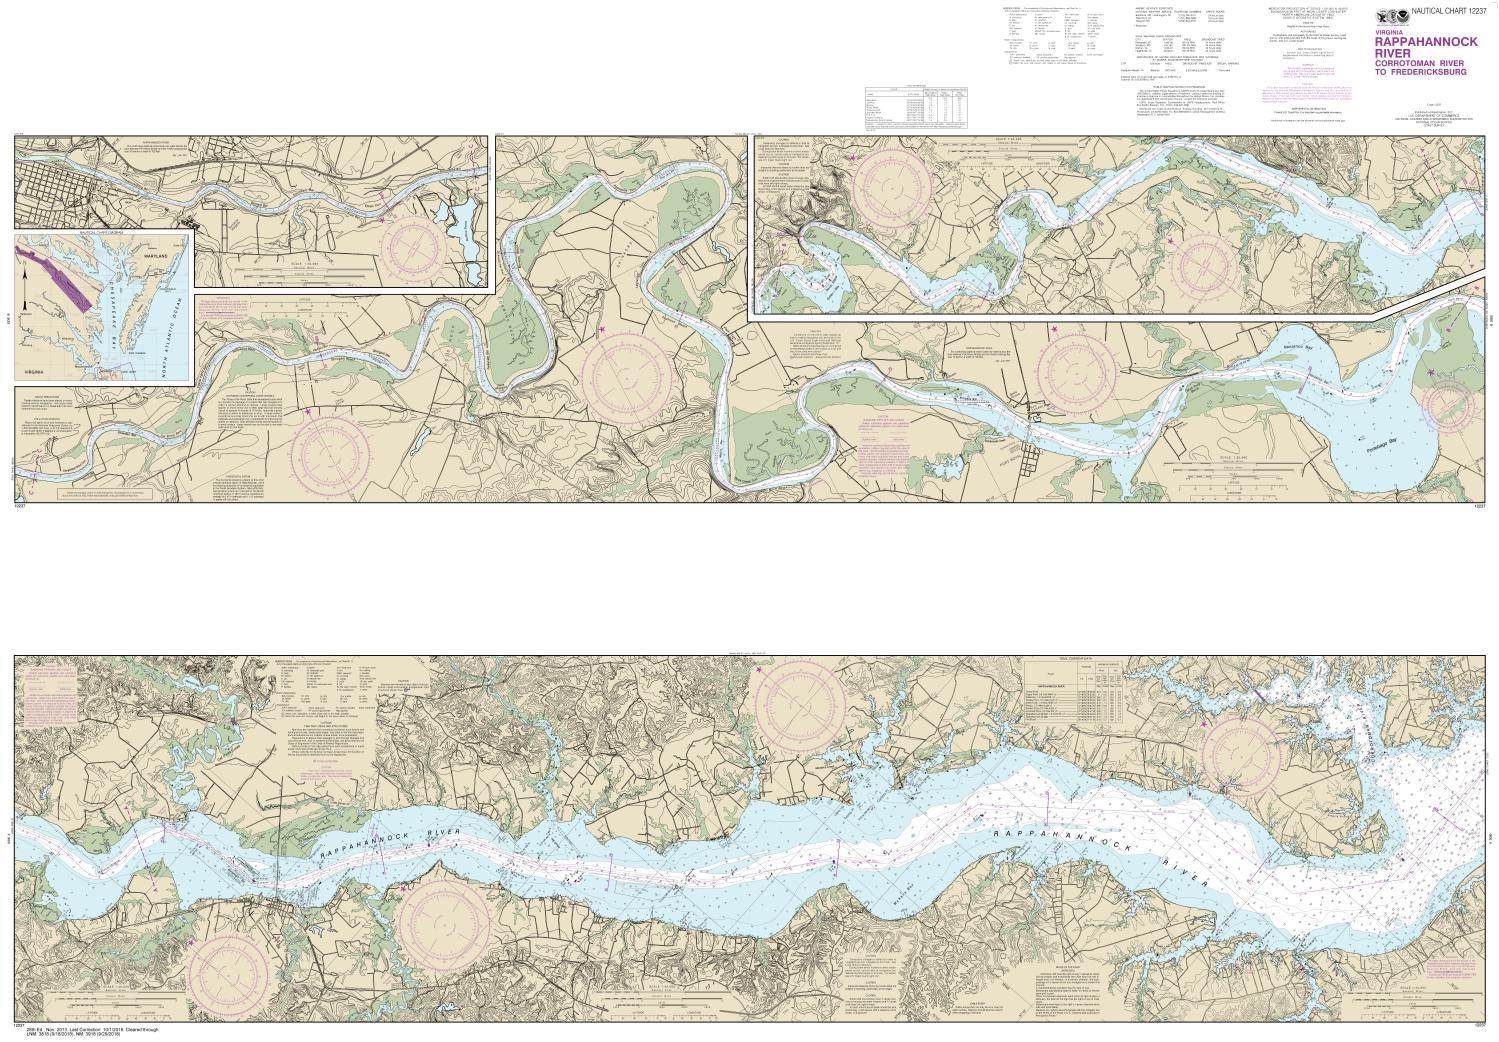 Noaa Chart 12237 Nautical Chart Of Rappahannock River Corrotoman River To Fredericksburg Noaa Charts Portray Water